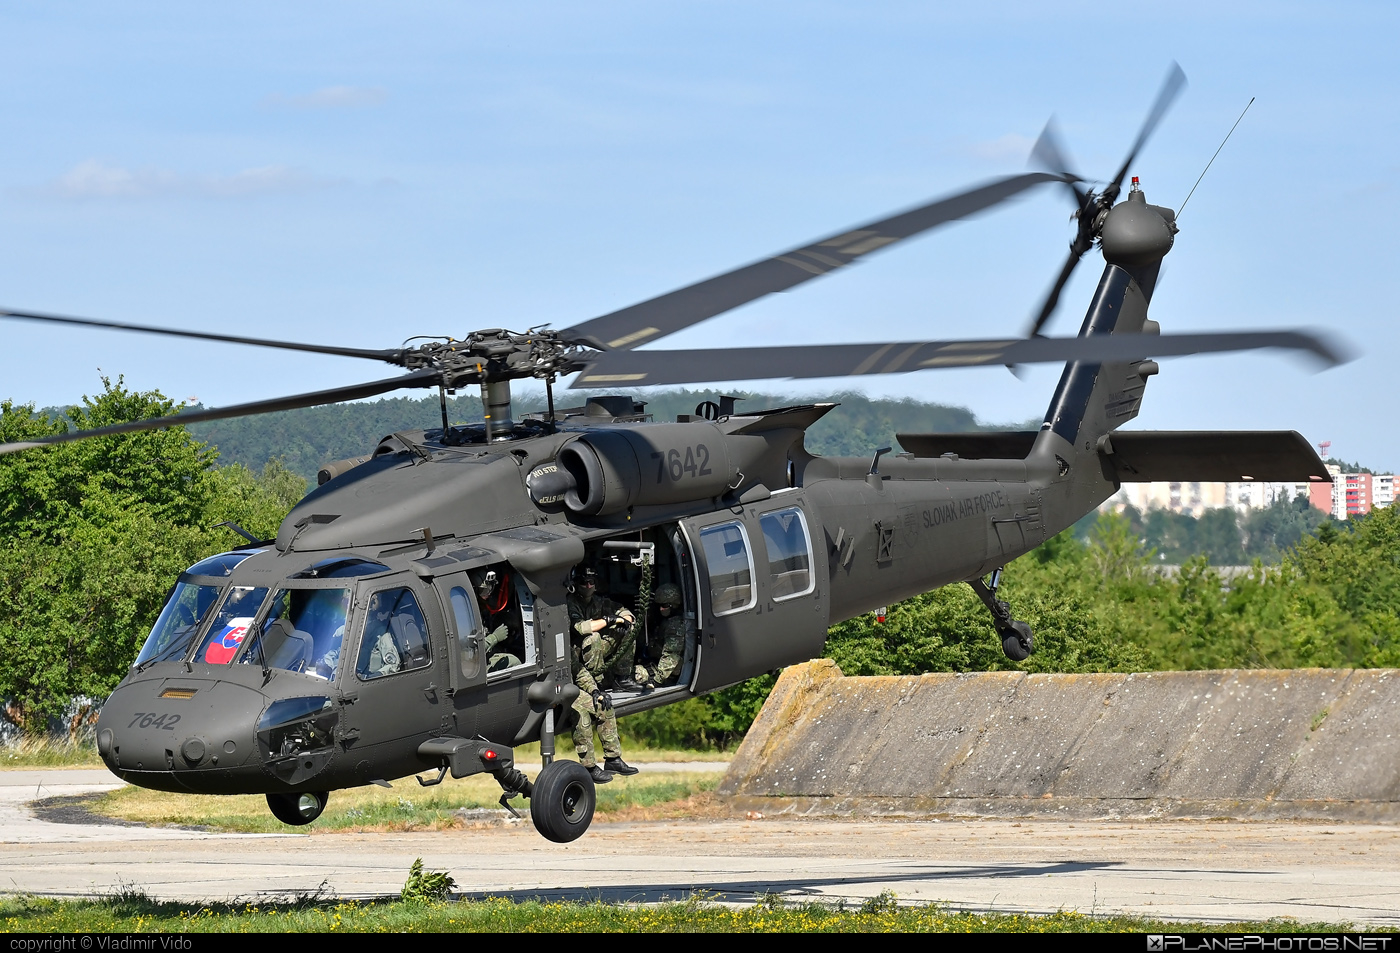 Sikorsky UH-60M Black Hawk - 7642 operated by Vzdušné sily OS SR (Slovak Air Force) #blackhawk #sikorsky #slovakairforce #uh60 #uh60blackhawk #uh60m #vzdusnesilyossr